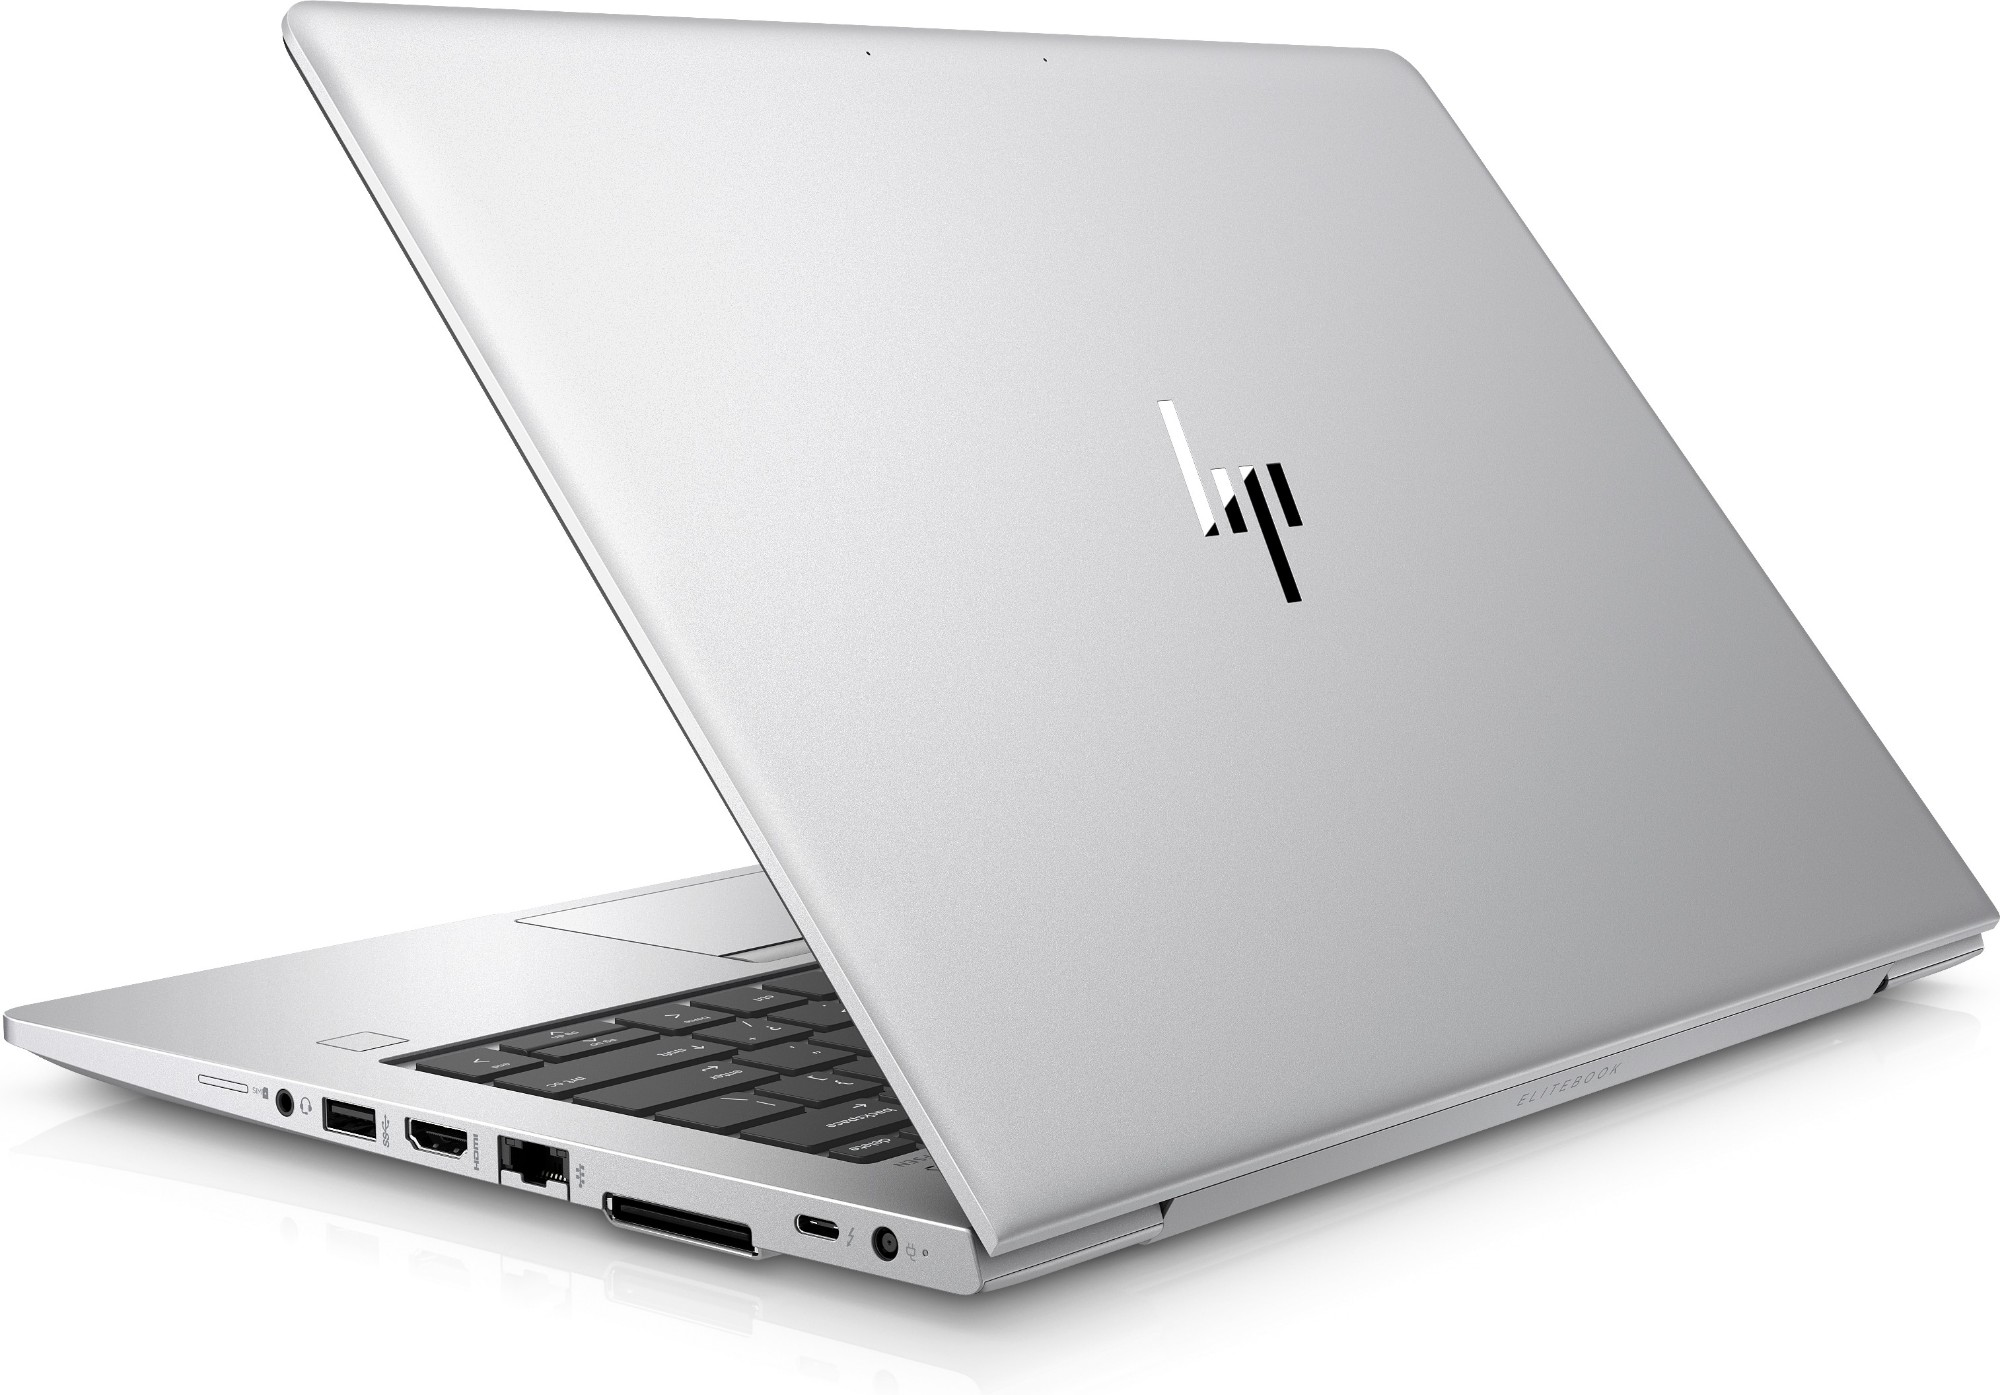 "HP EliteBook 830 G5 Silver Notebook 33.8 cm (13.3"") 1920 x 1080 pixels 1.80 GHz 8th gen Intel® Core™ i7 i7-8550U"